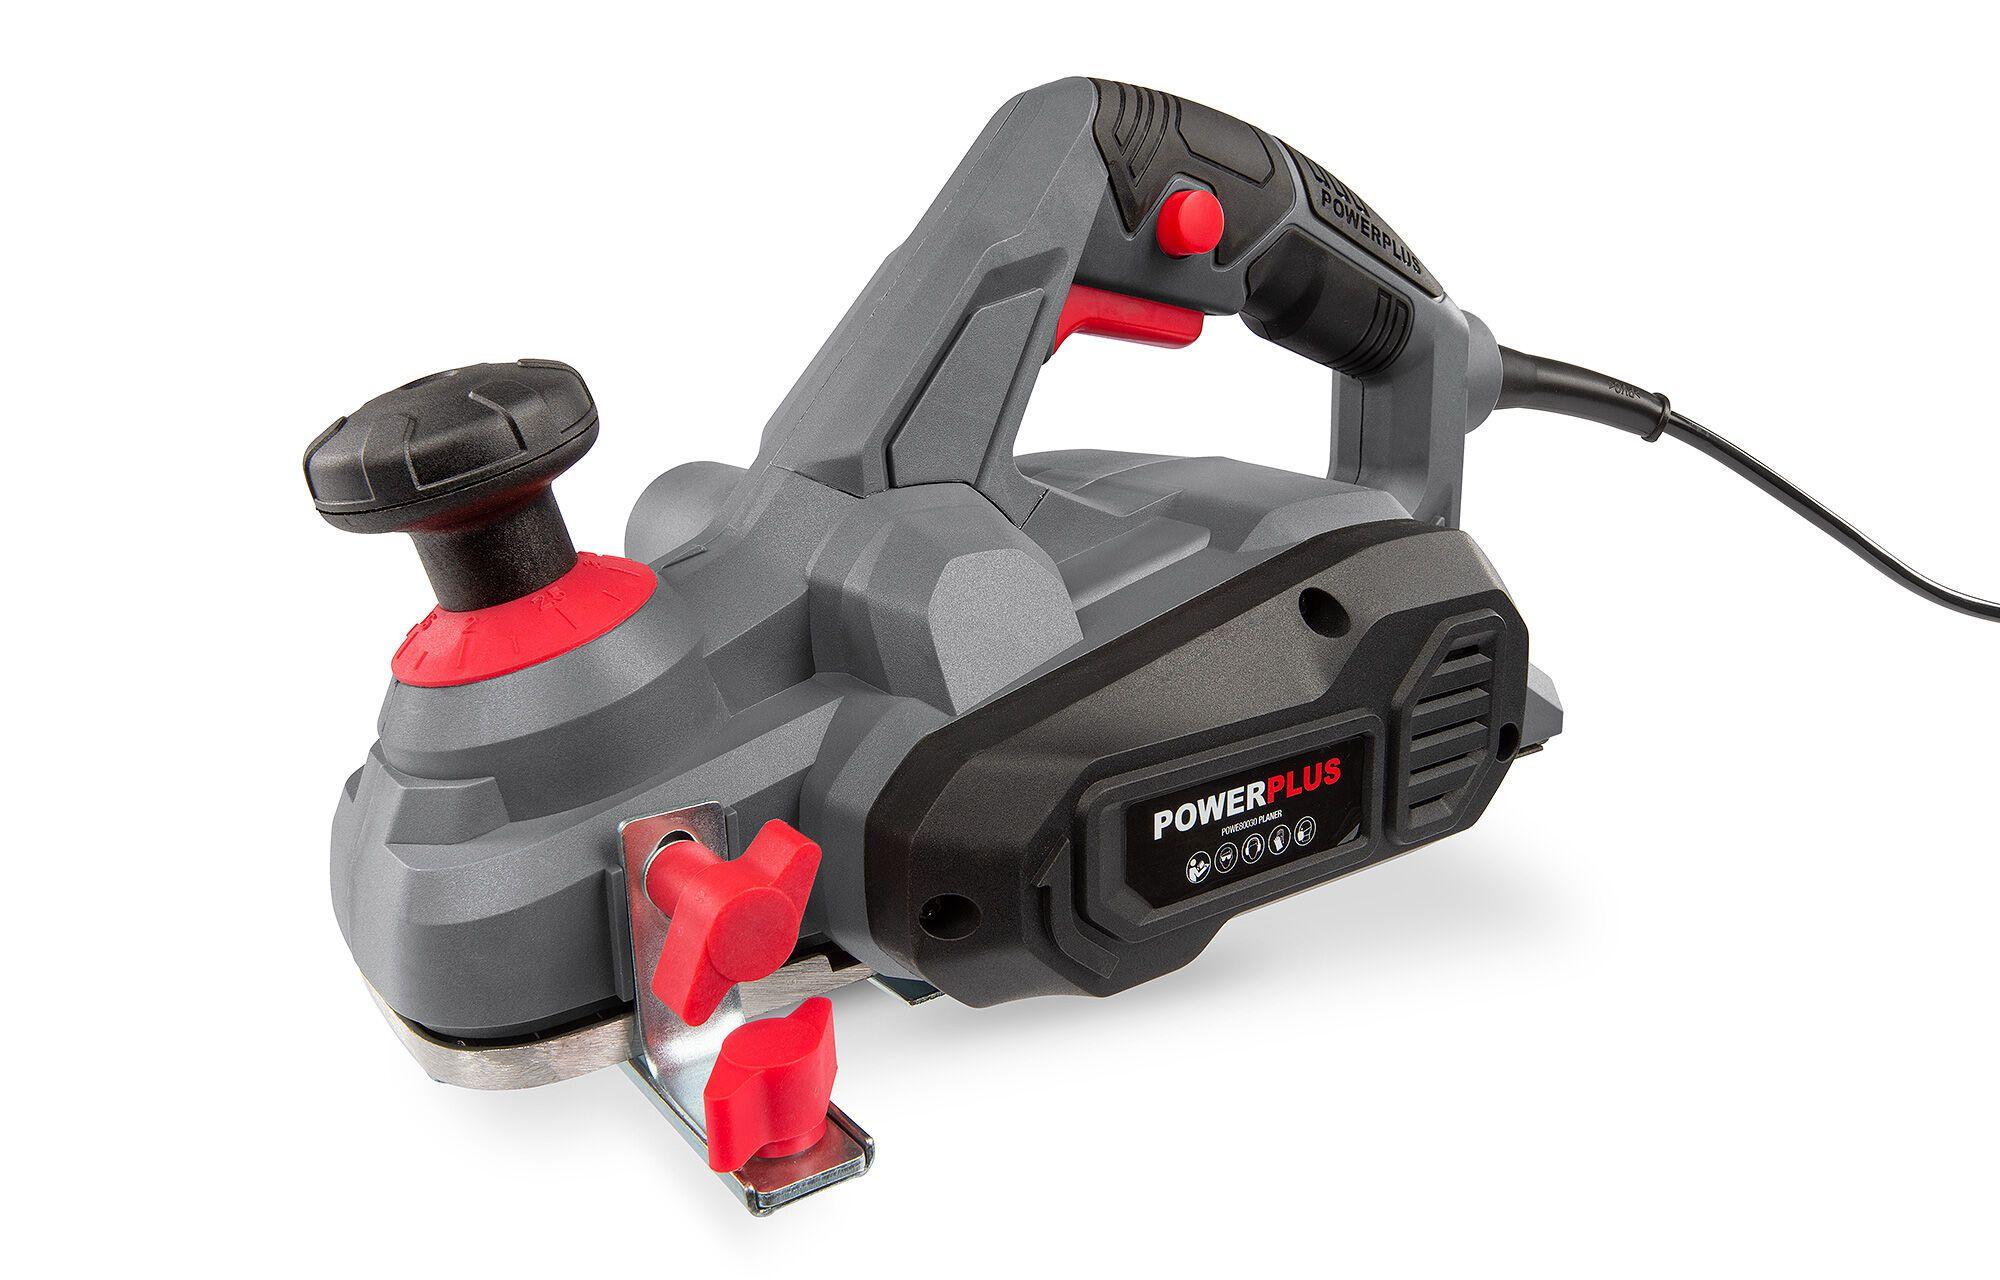 Powerplus POWE80030 Elektrische schaafmachine 900W